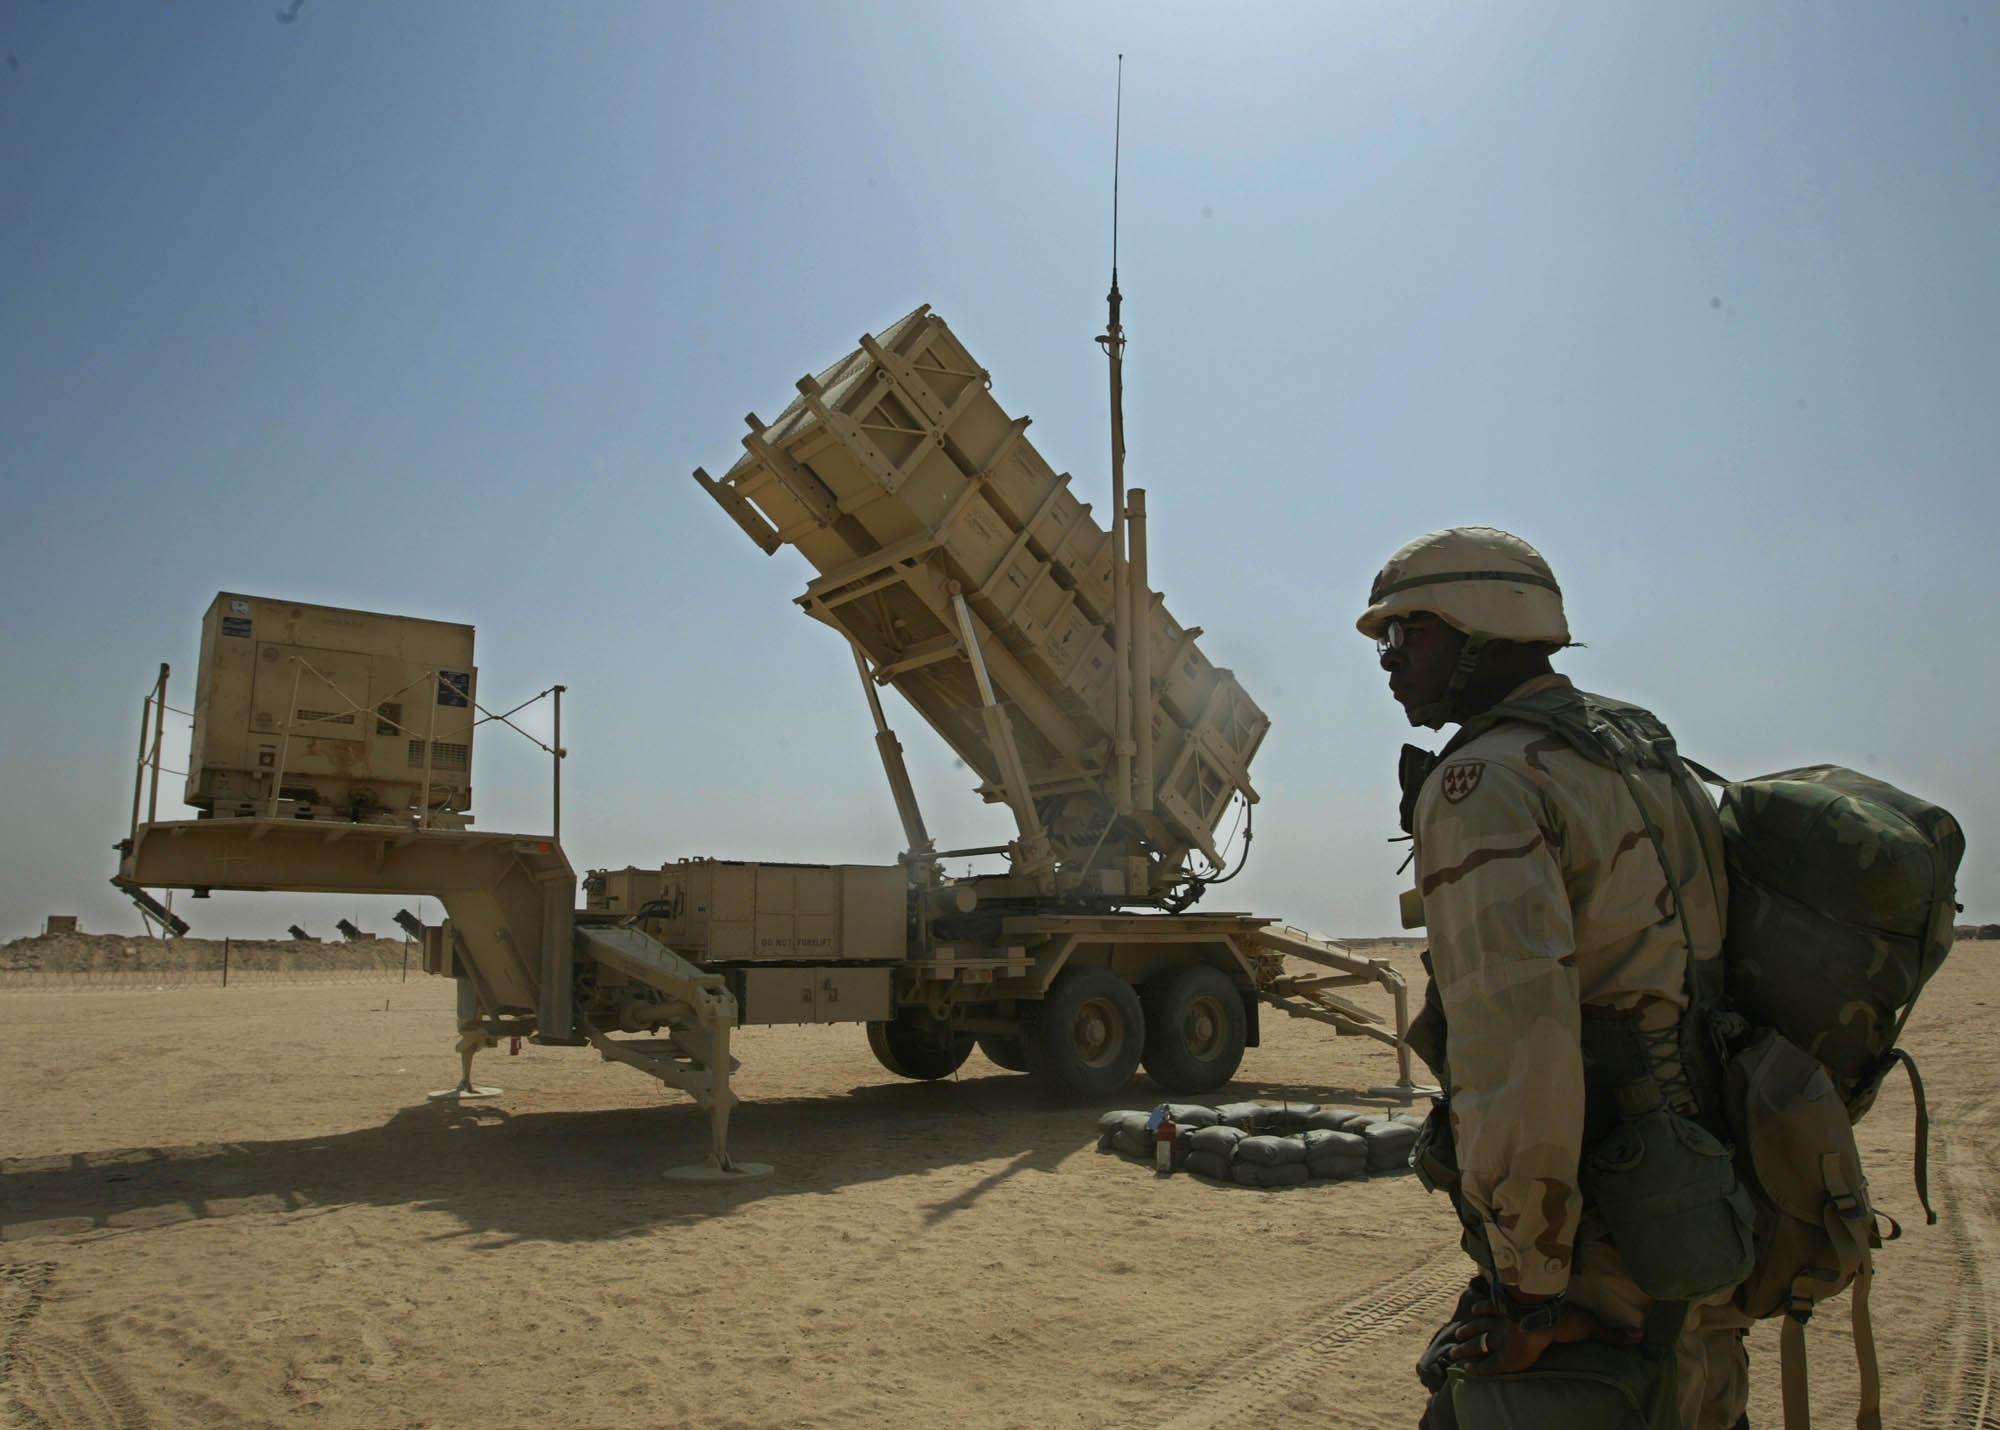 U.S. To Deploy Air-Defense Systems, 200 Troops In Saudi Arabia